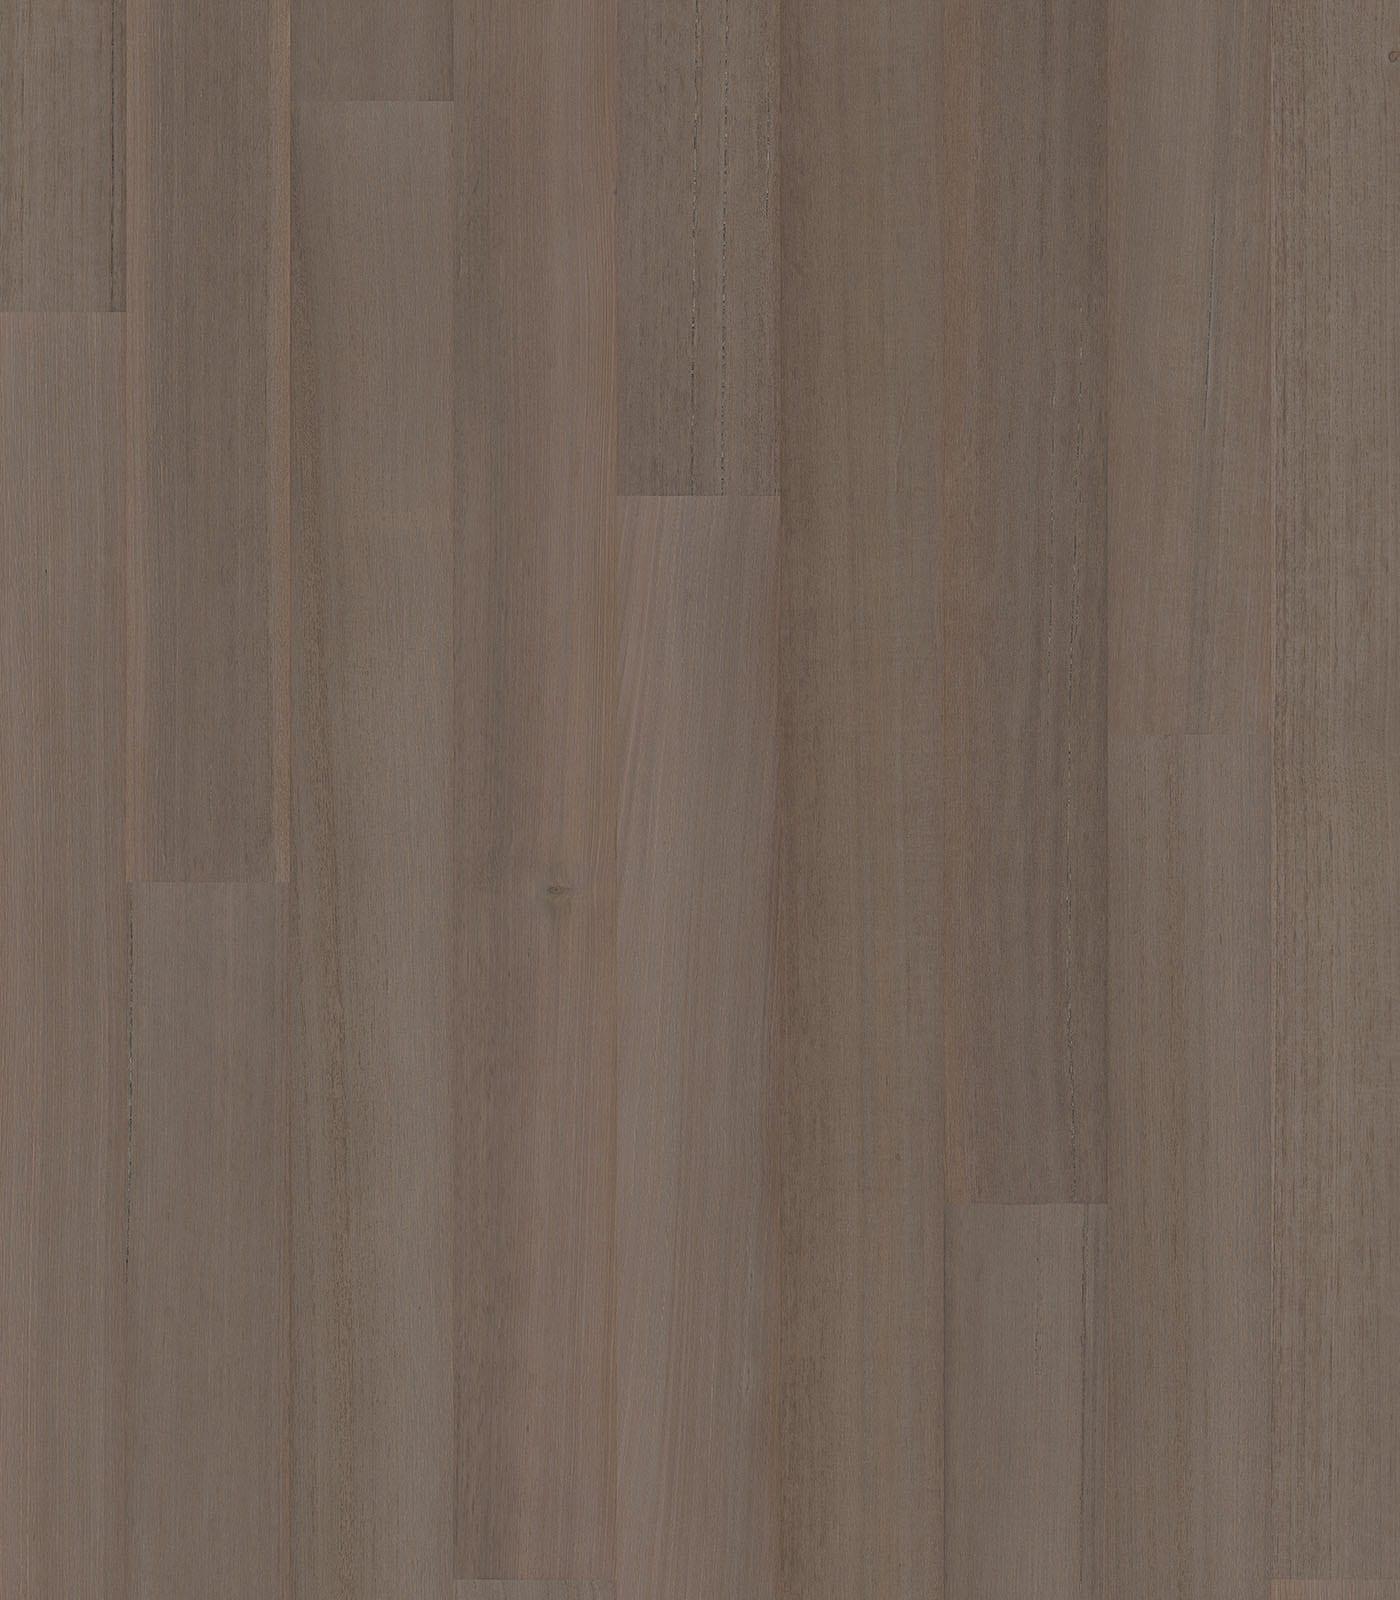 Brisbane-After Oak Collection-Tasmanian Oak floors-flat